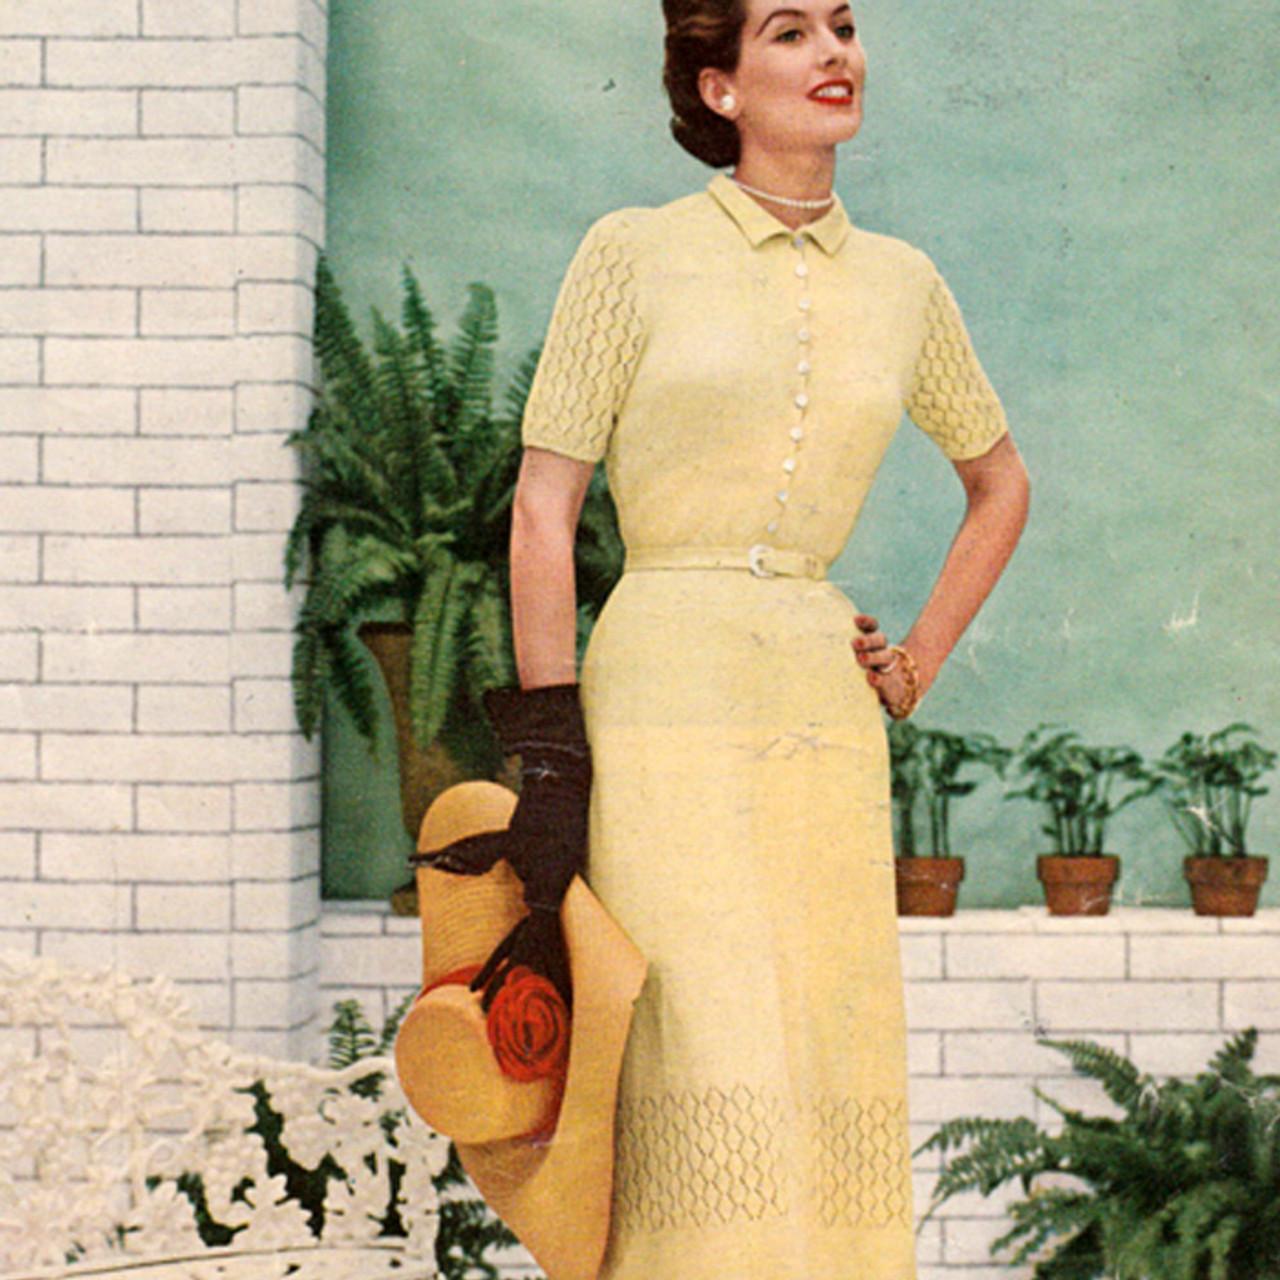 Vintage 1950s dress knitting pattern from Bernat